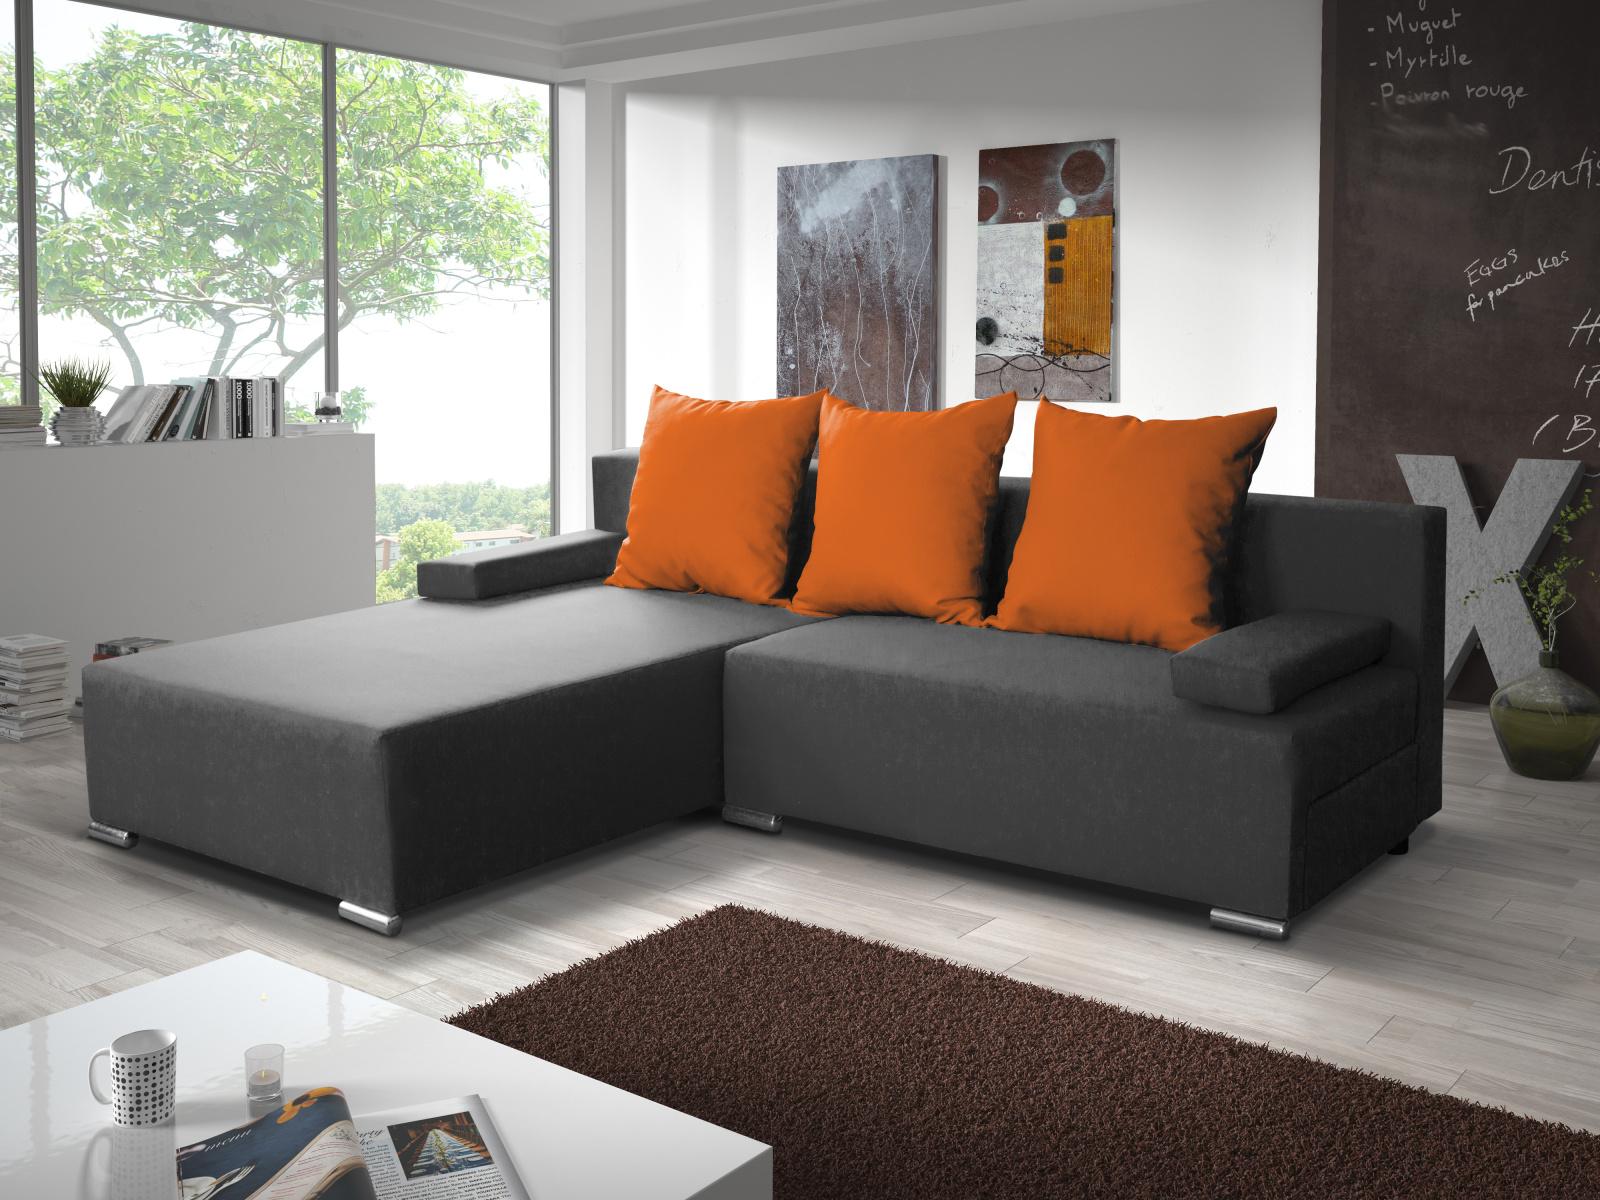 Smartshop Rohová sedačka CANDY 4, šedá/oranžová